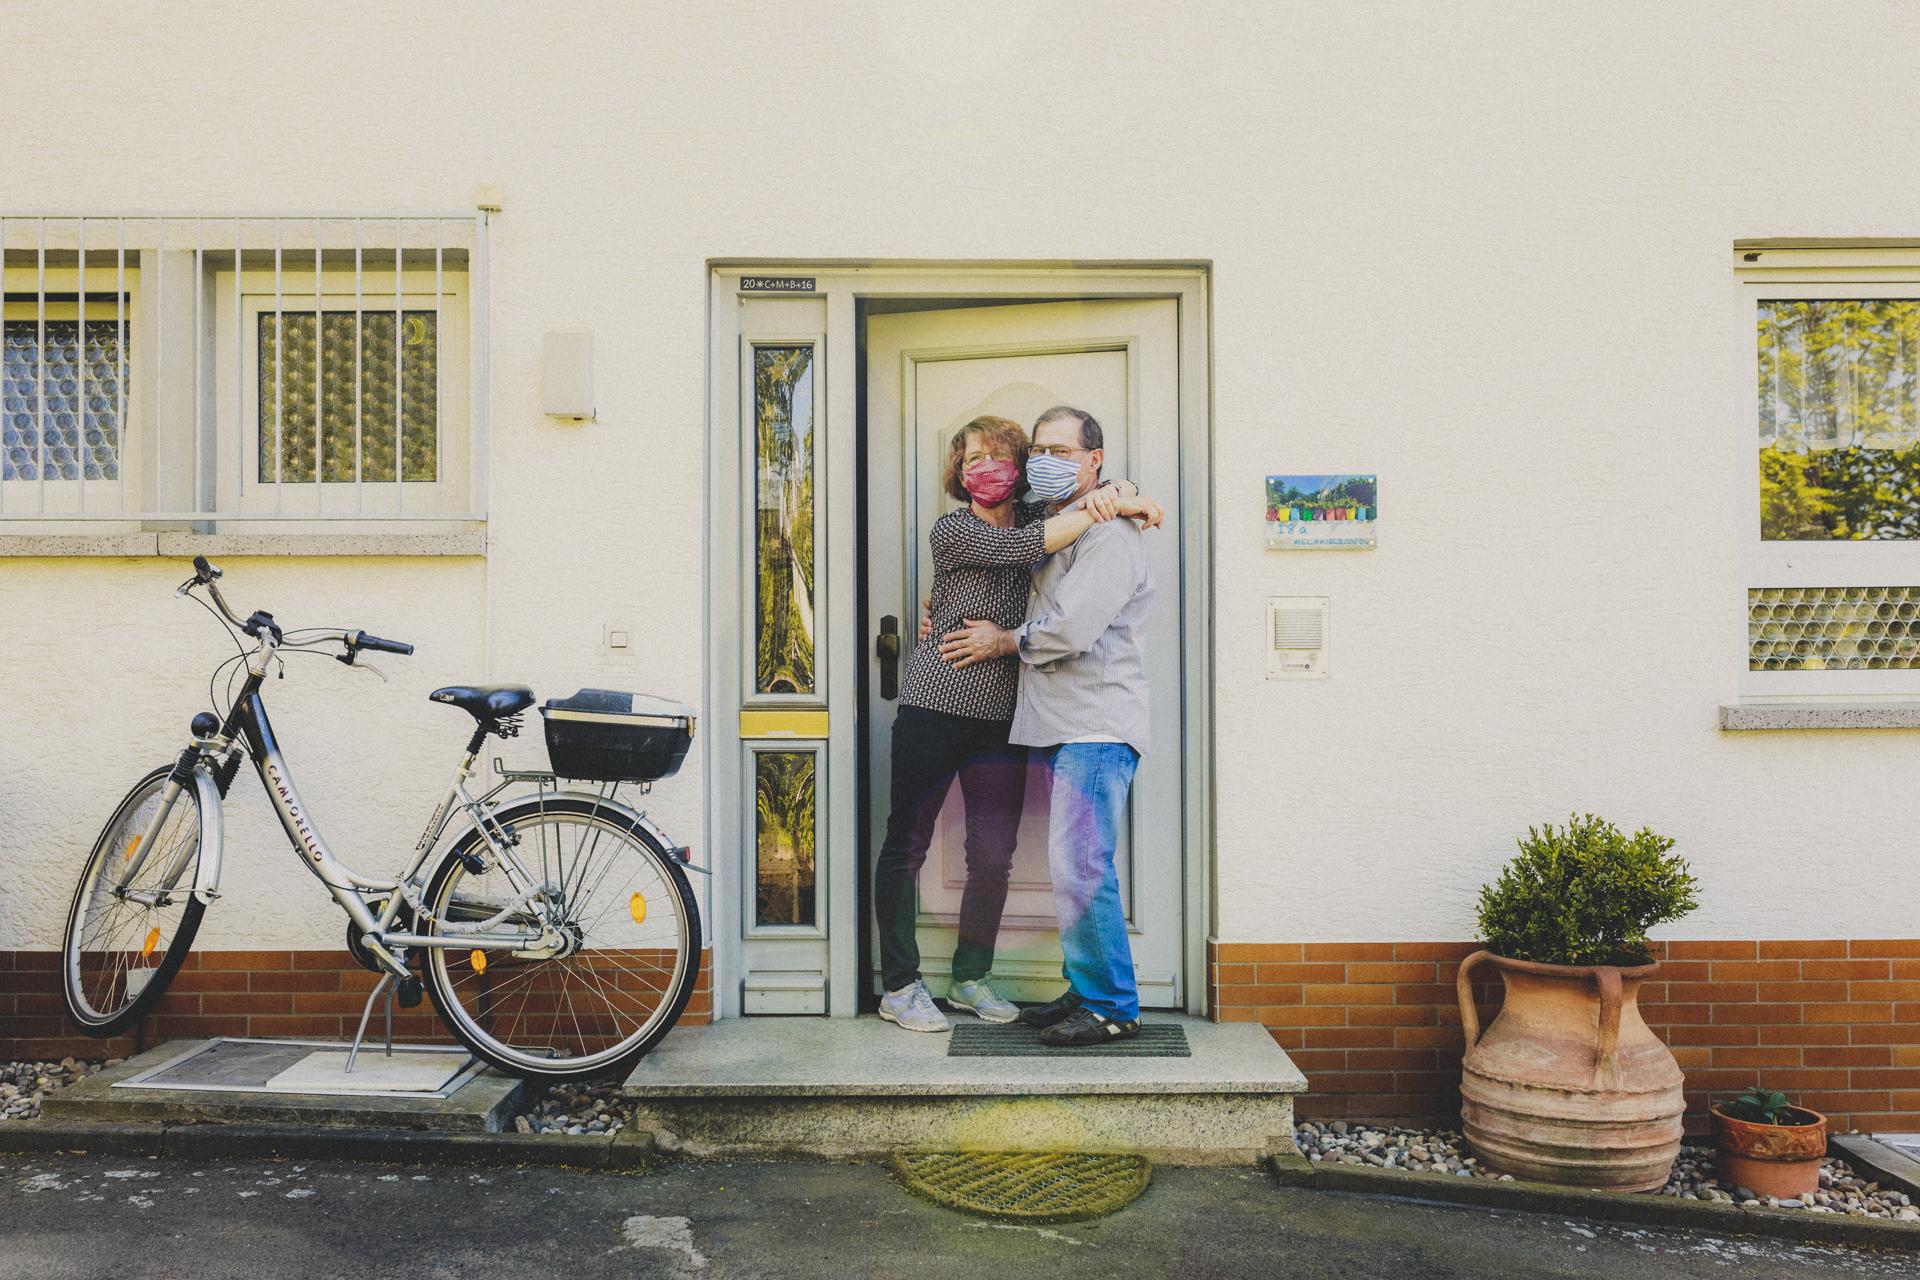 Corona-Fotoshooting - Haustür-Shootings Giessen, Marburg, Wetzlar, Grünberg, Frankfurt, Hessen - Familienfotograf - Familienbilder